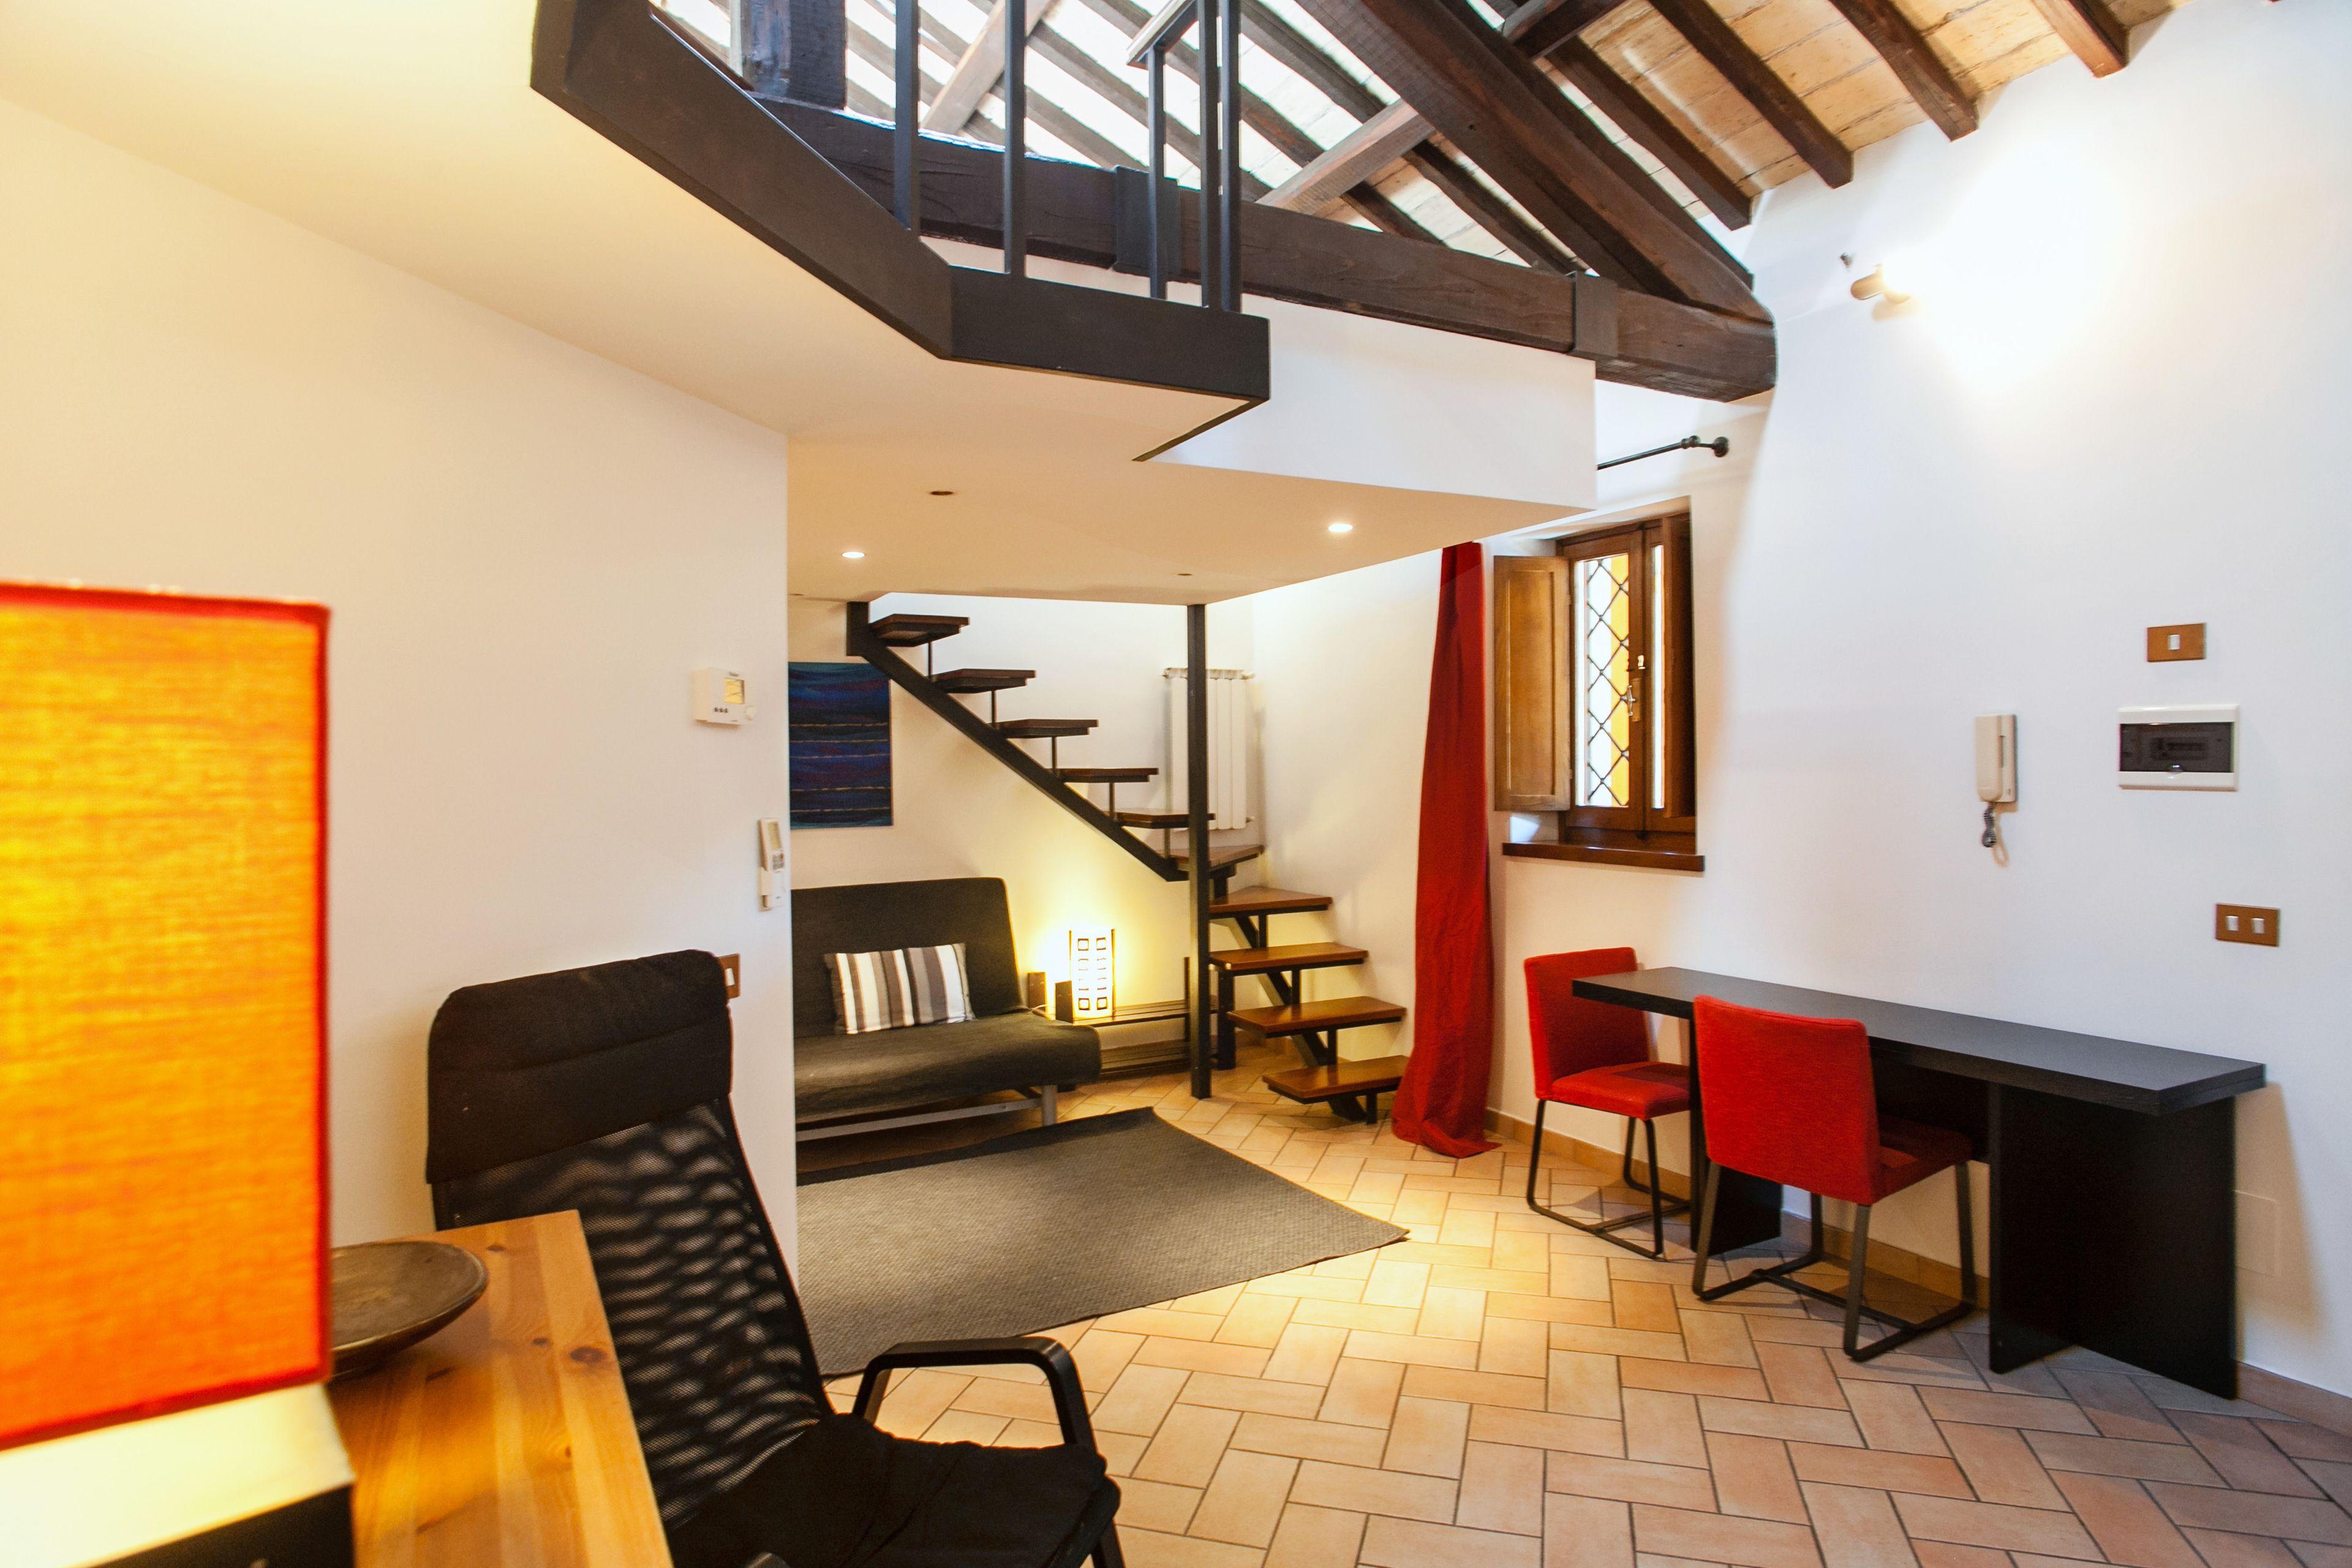 Cozy Apartment In Via Dei Cappellari Campo De Fiori Precos Promocoes E Comentarios Expedia Com Br